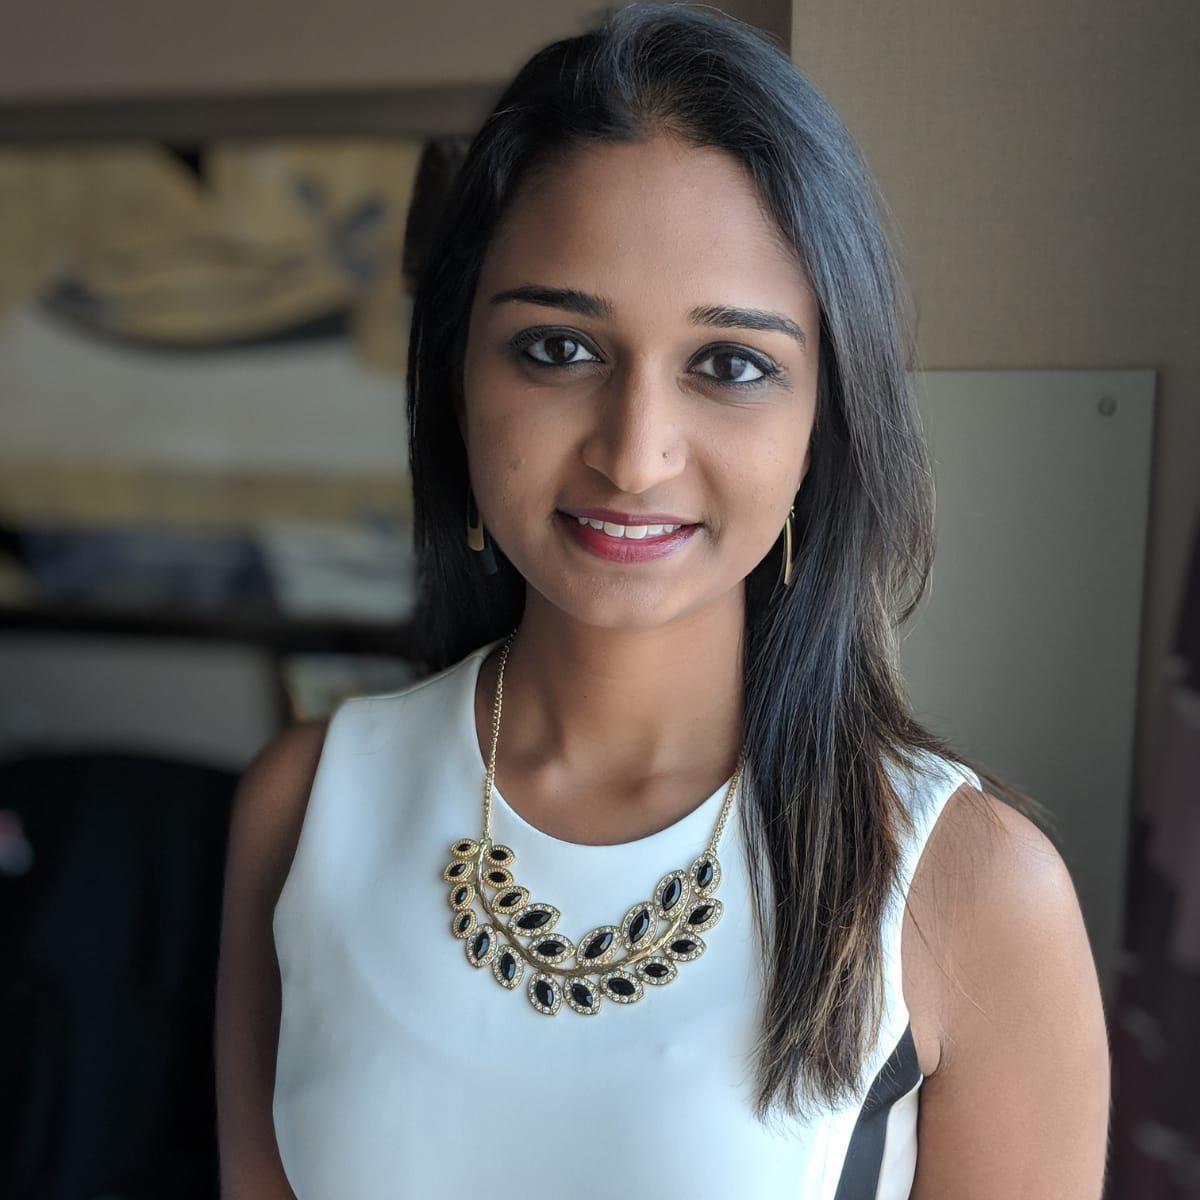 Pooja Couplr App founder